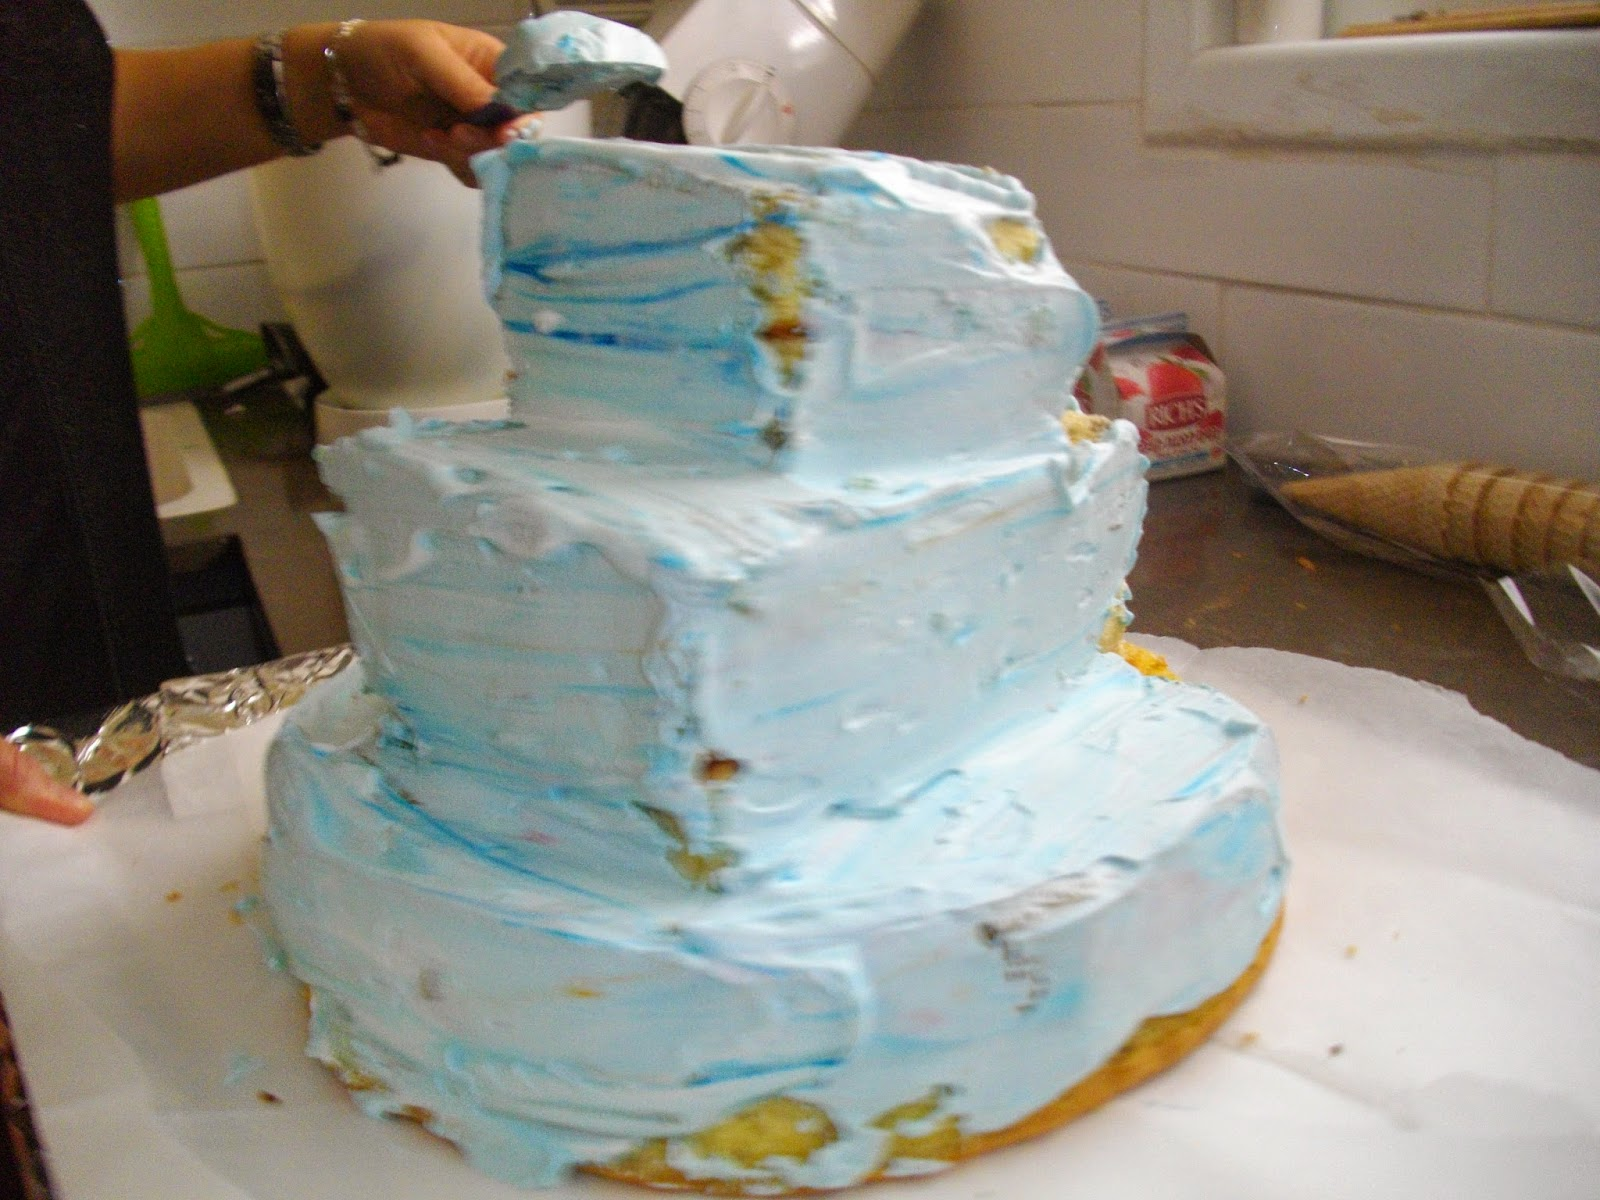 IMGP2867 - עוגת יומולדת בצורת ארמון